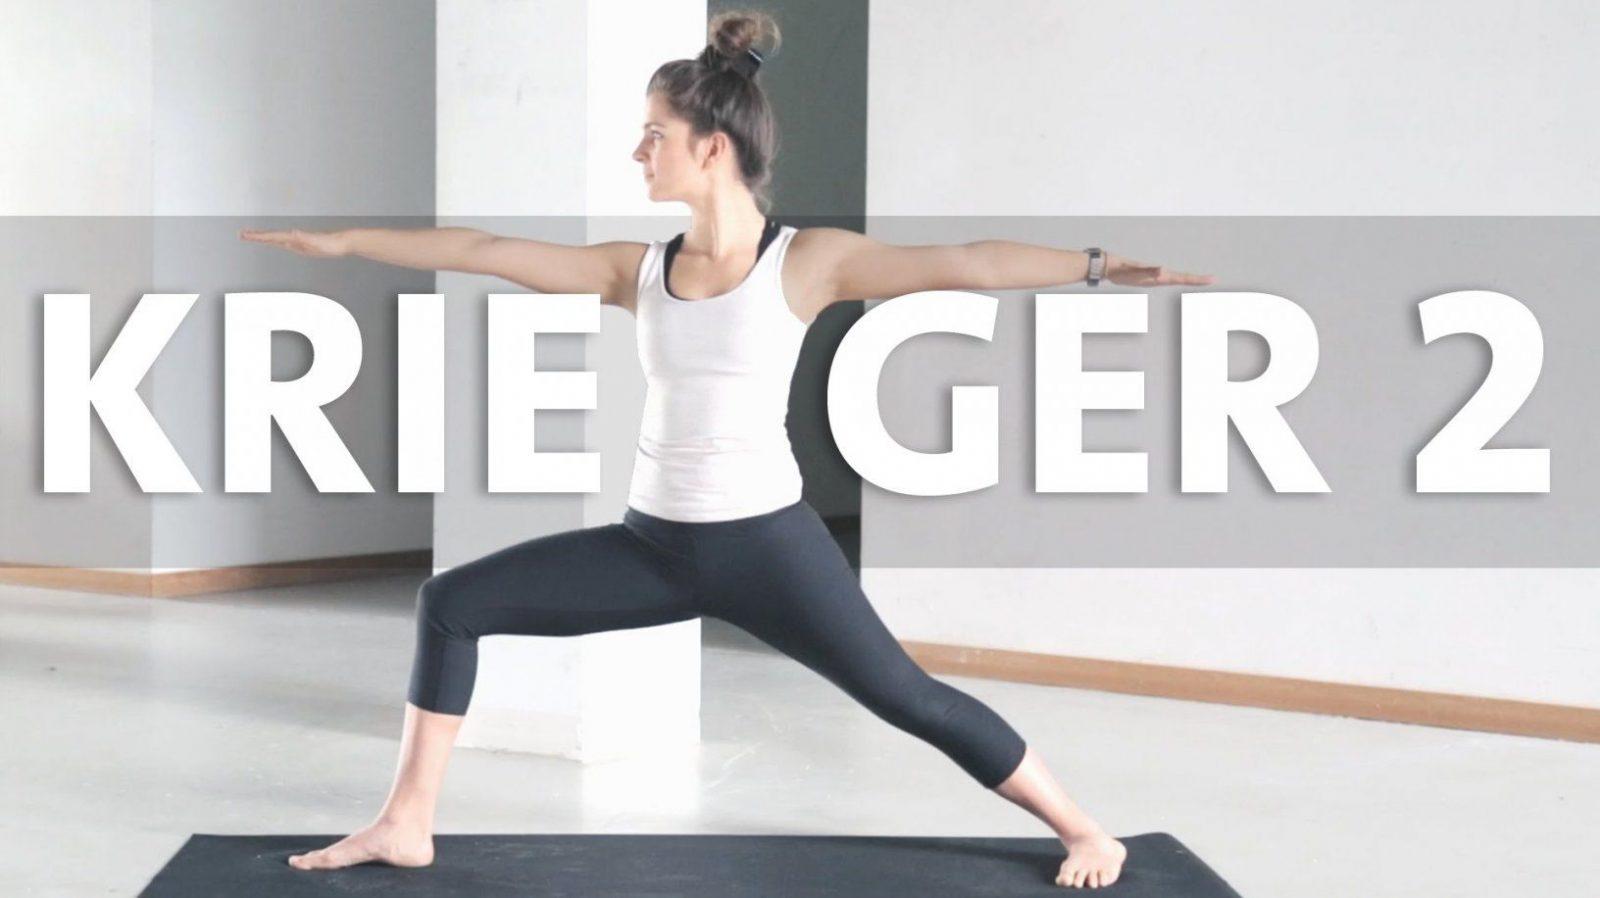 Yoga Anfänger  Krieger 2 Asana Lernen  Virabhadrasana 2  Youtube von Yoga Lernen Zu Hause Bild